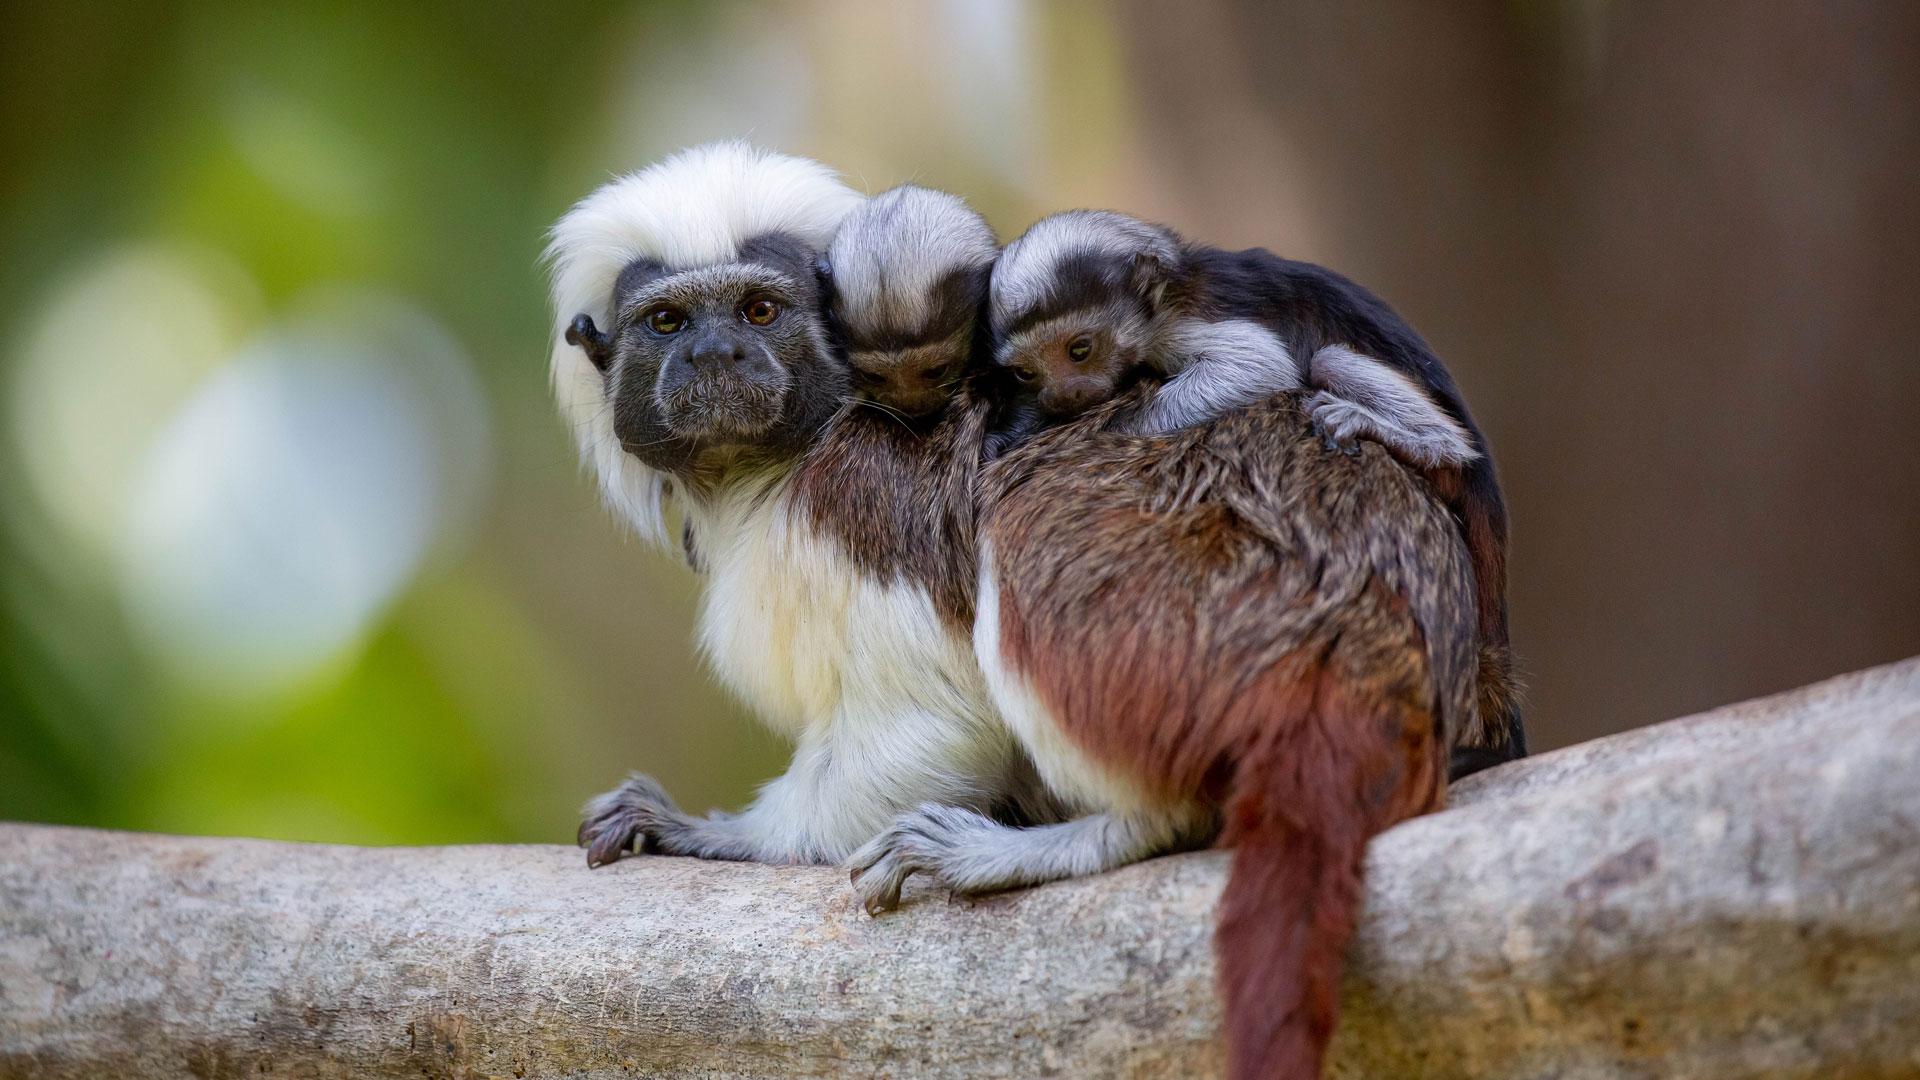 https://rfacdn.nz/zoo/assets/media/cotton-top-twins-gallery-4.jpg